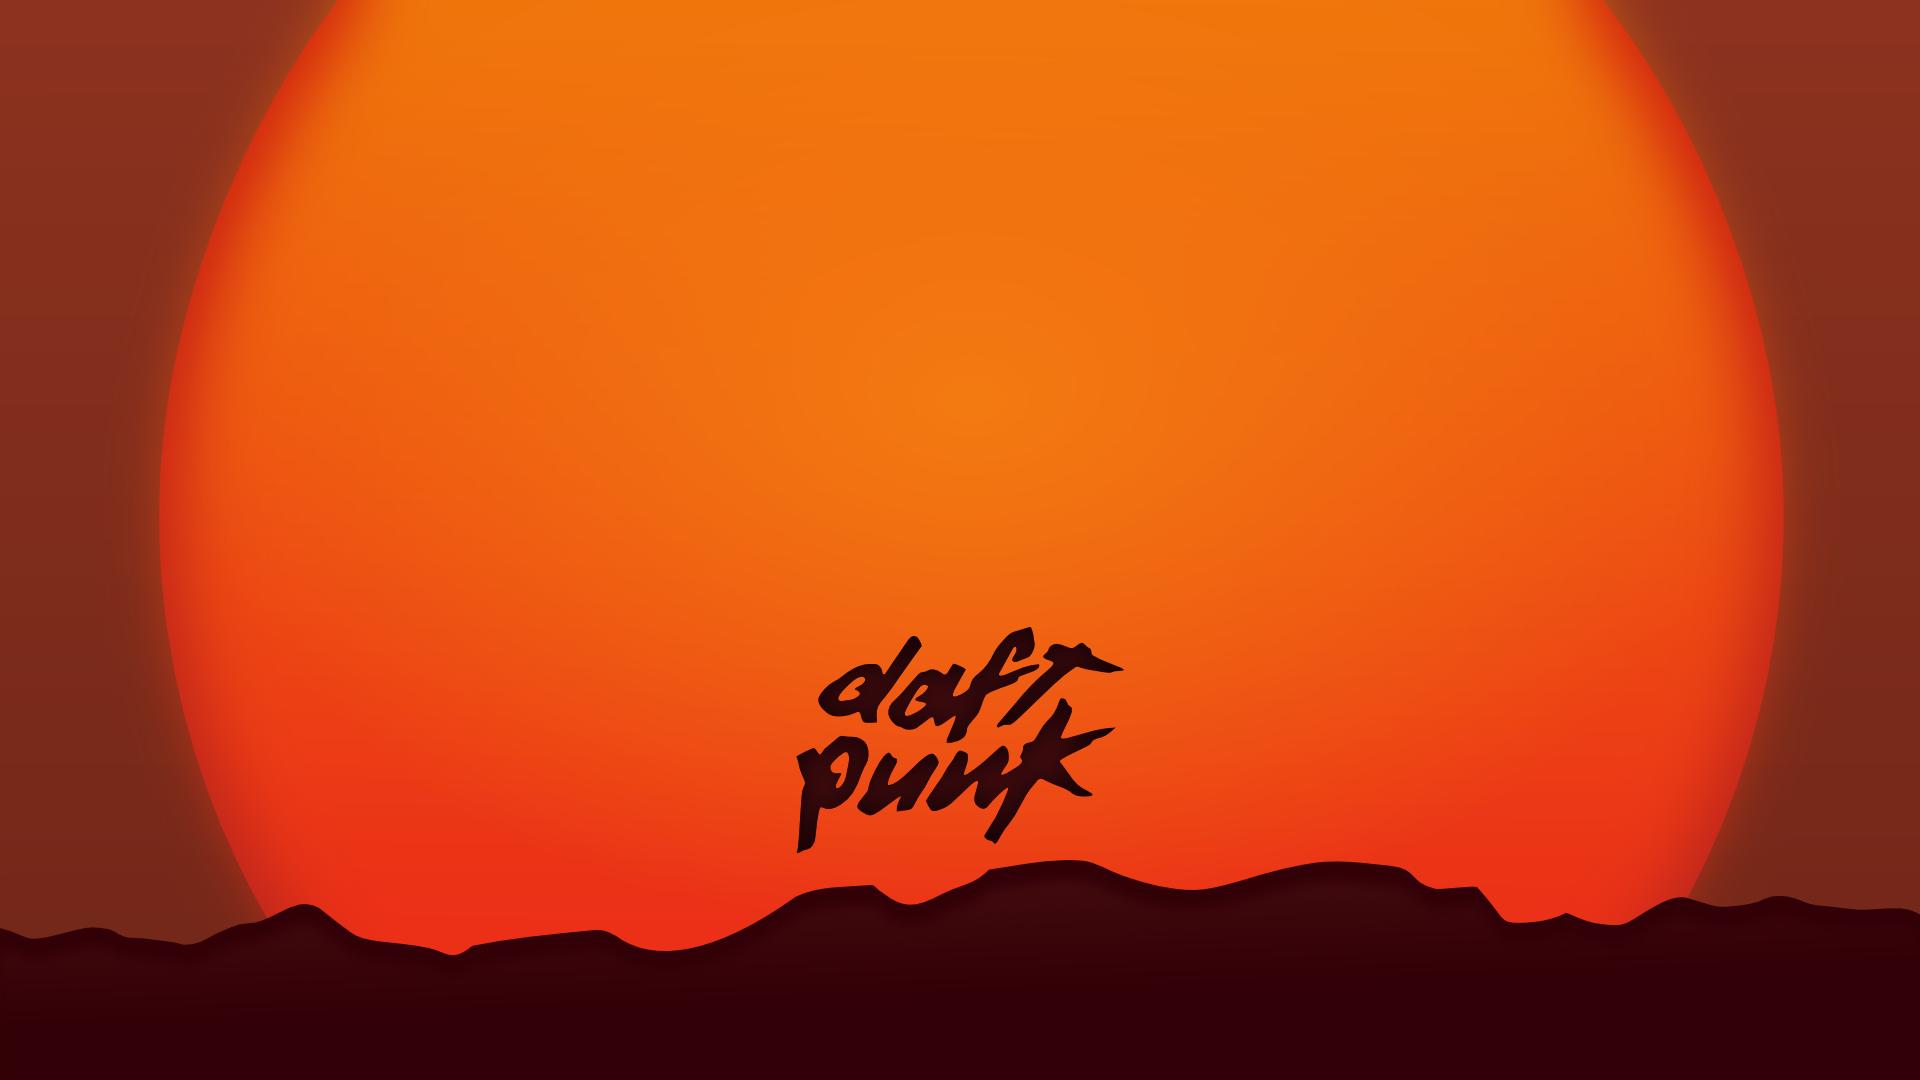 Daft Punk - Get Lucky (sunrise scene) by kartine29